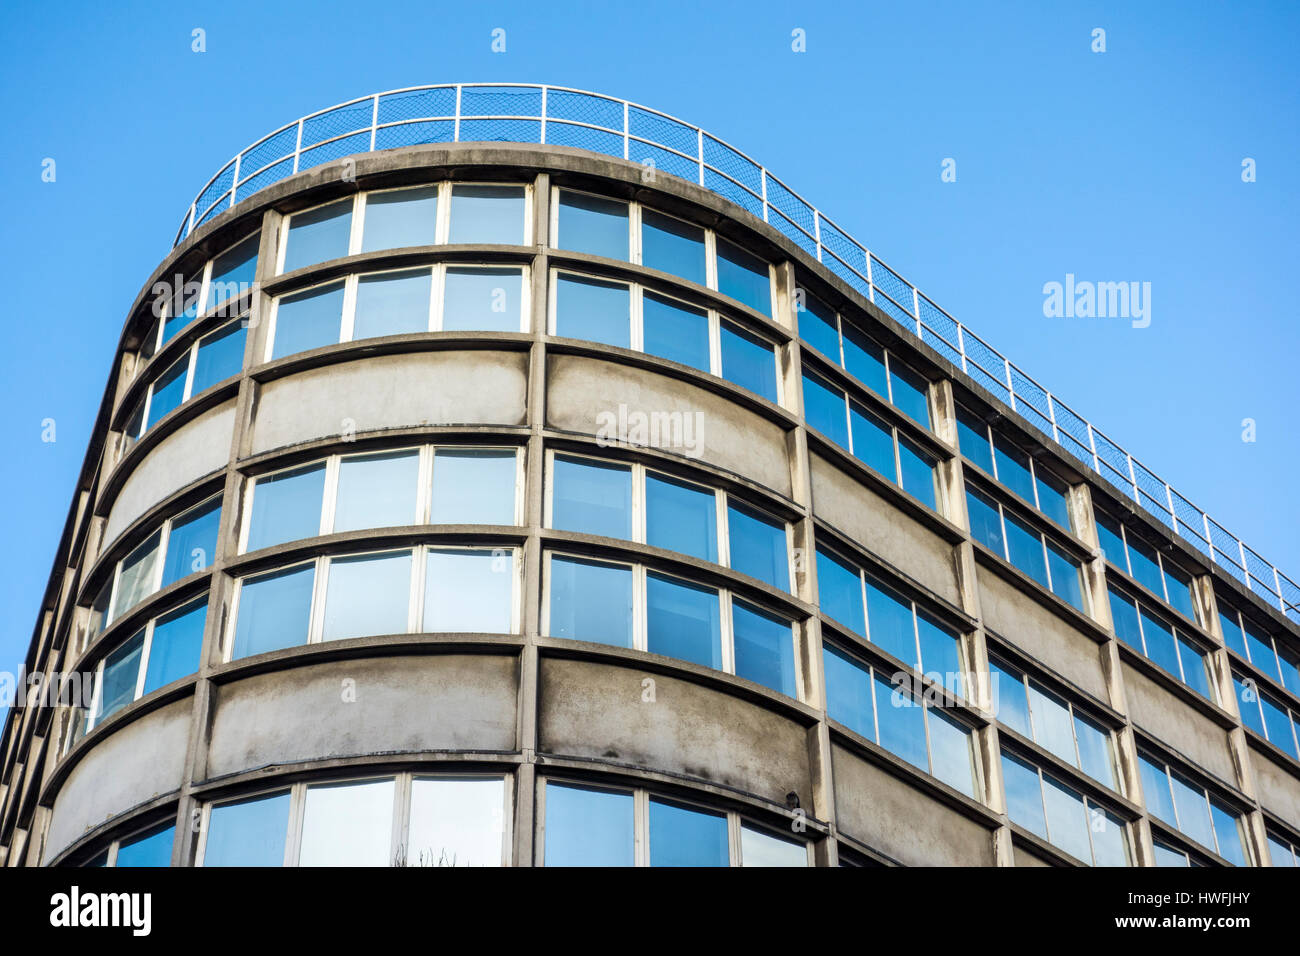 Titan House, 144 Southwark Street, London, UK - Stock Image